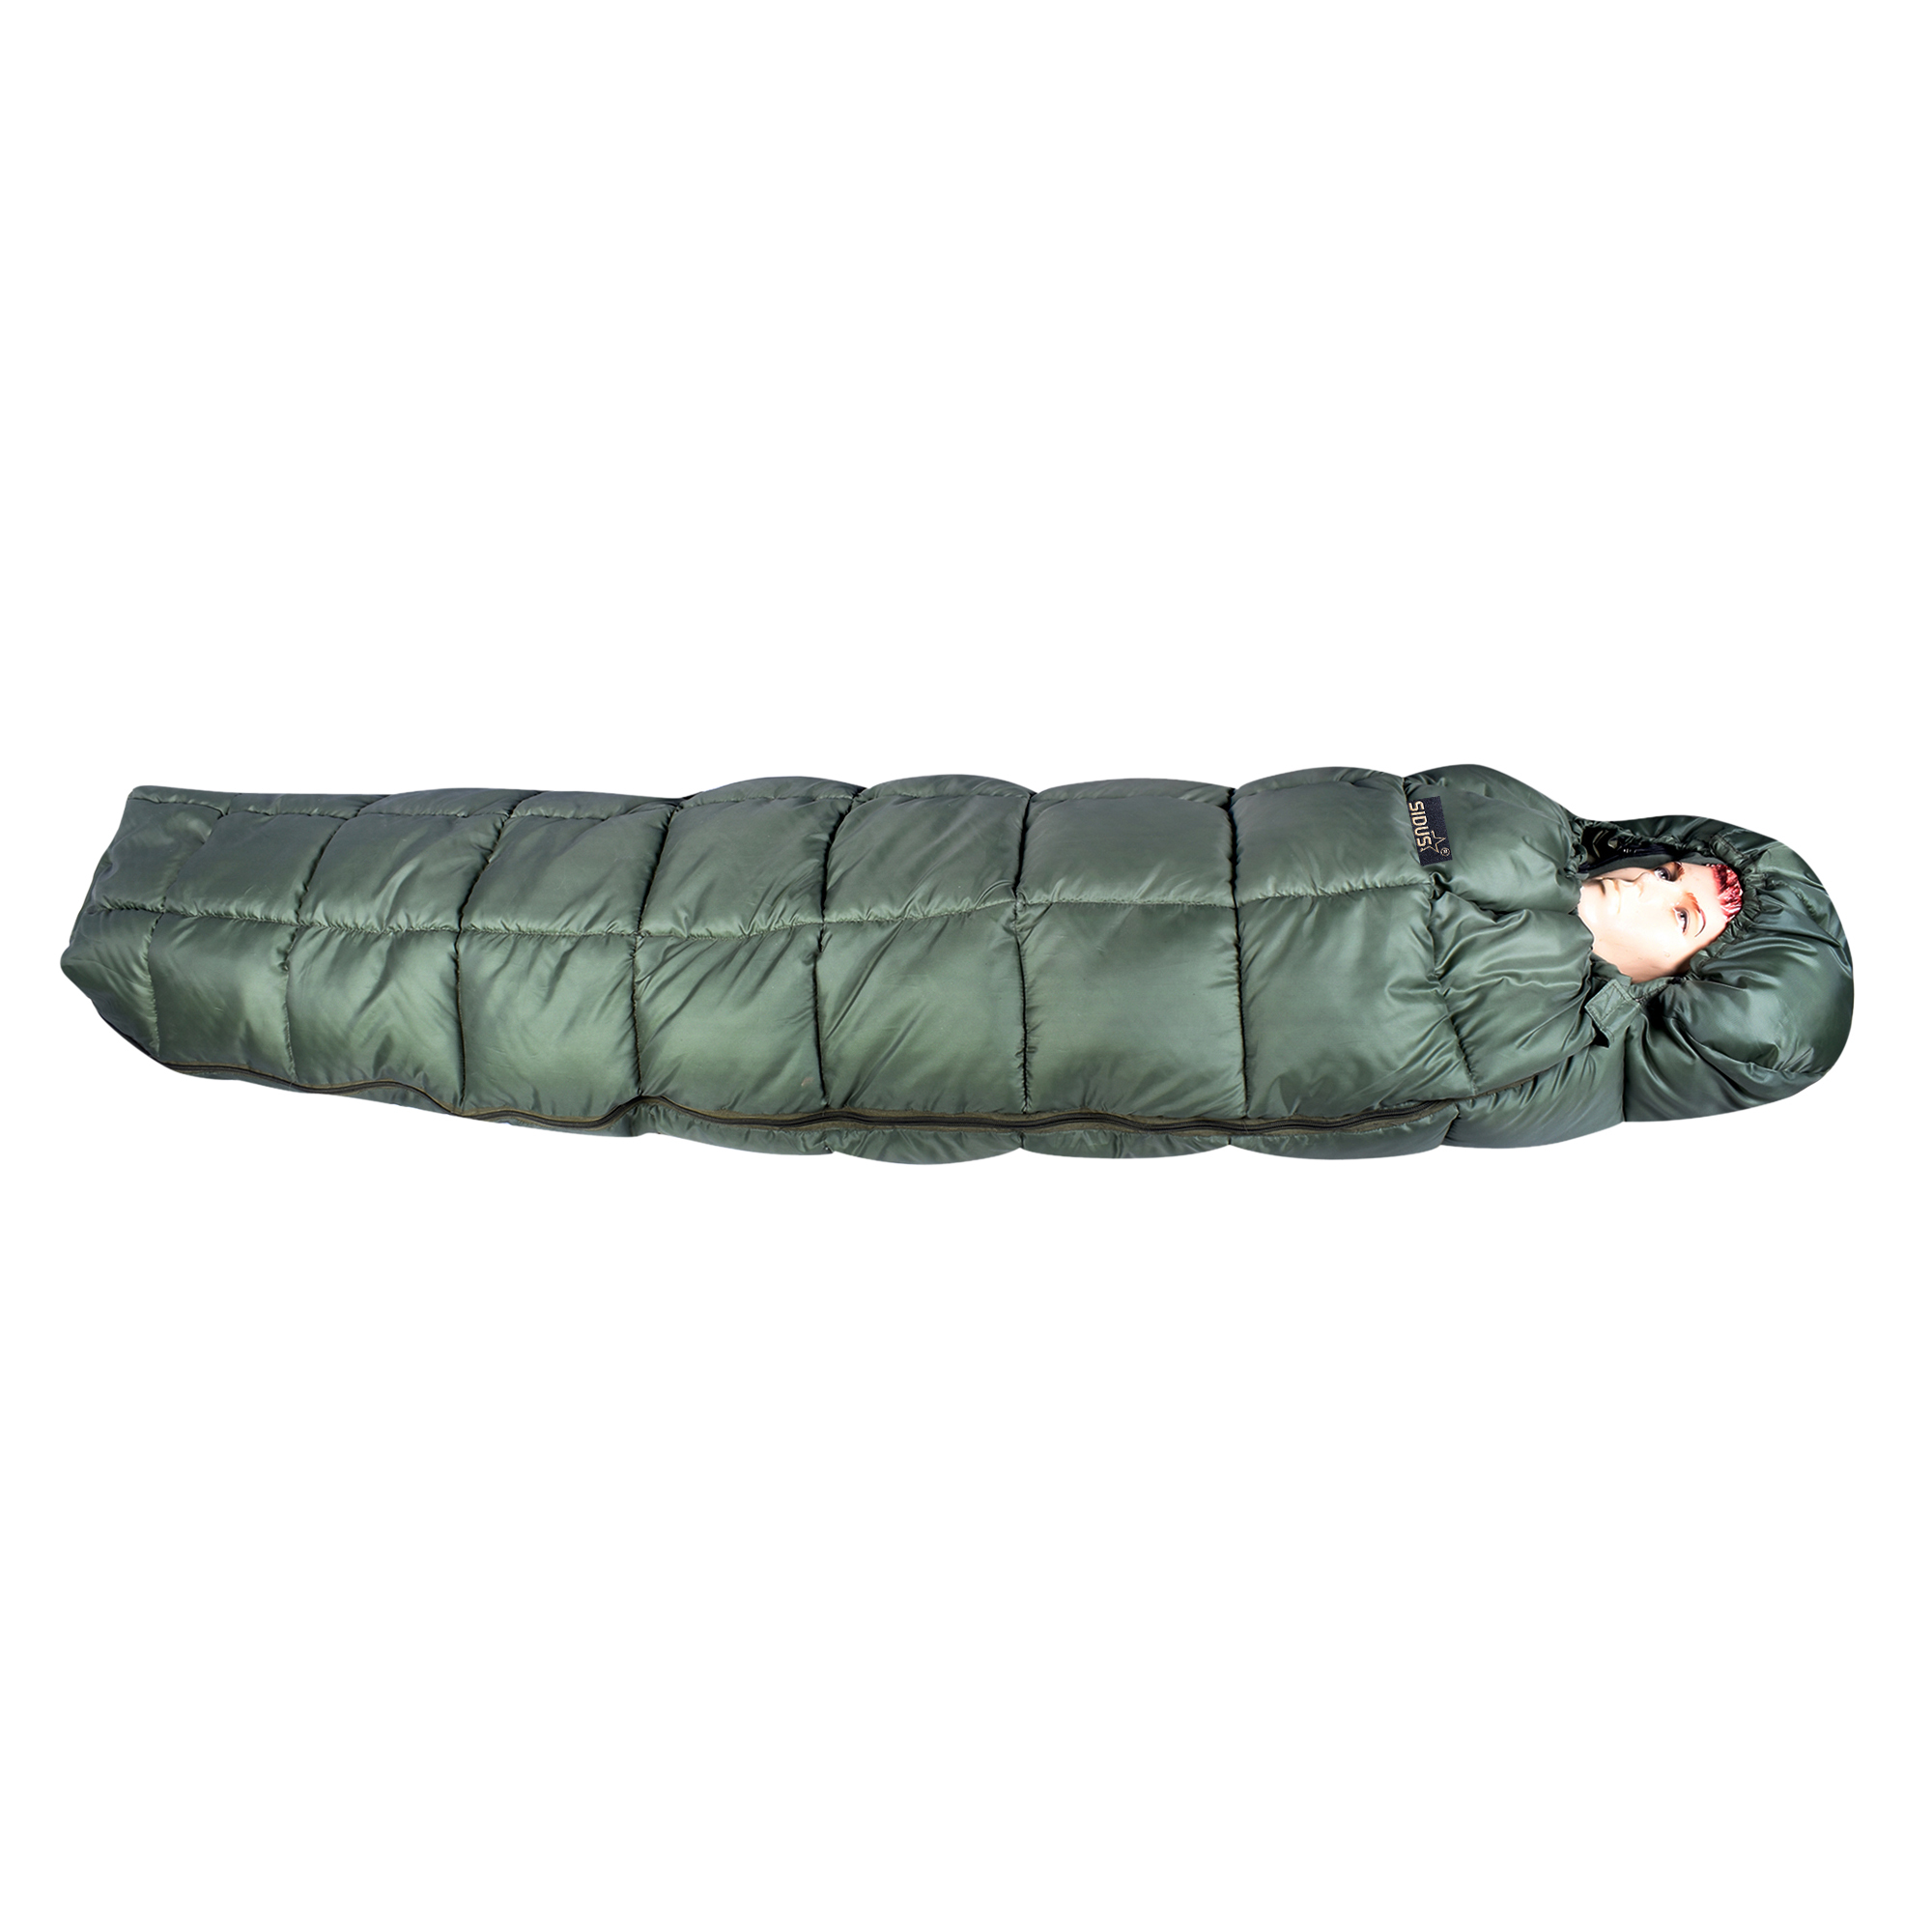 Travel Sleeping Bags